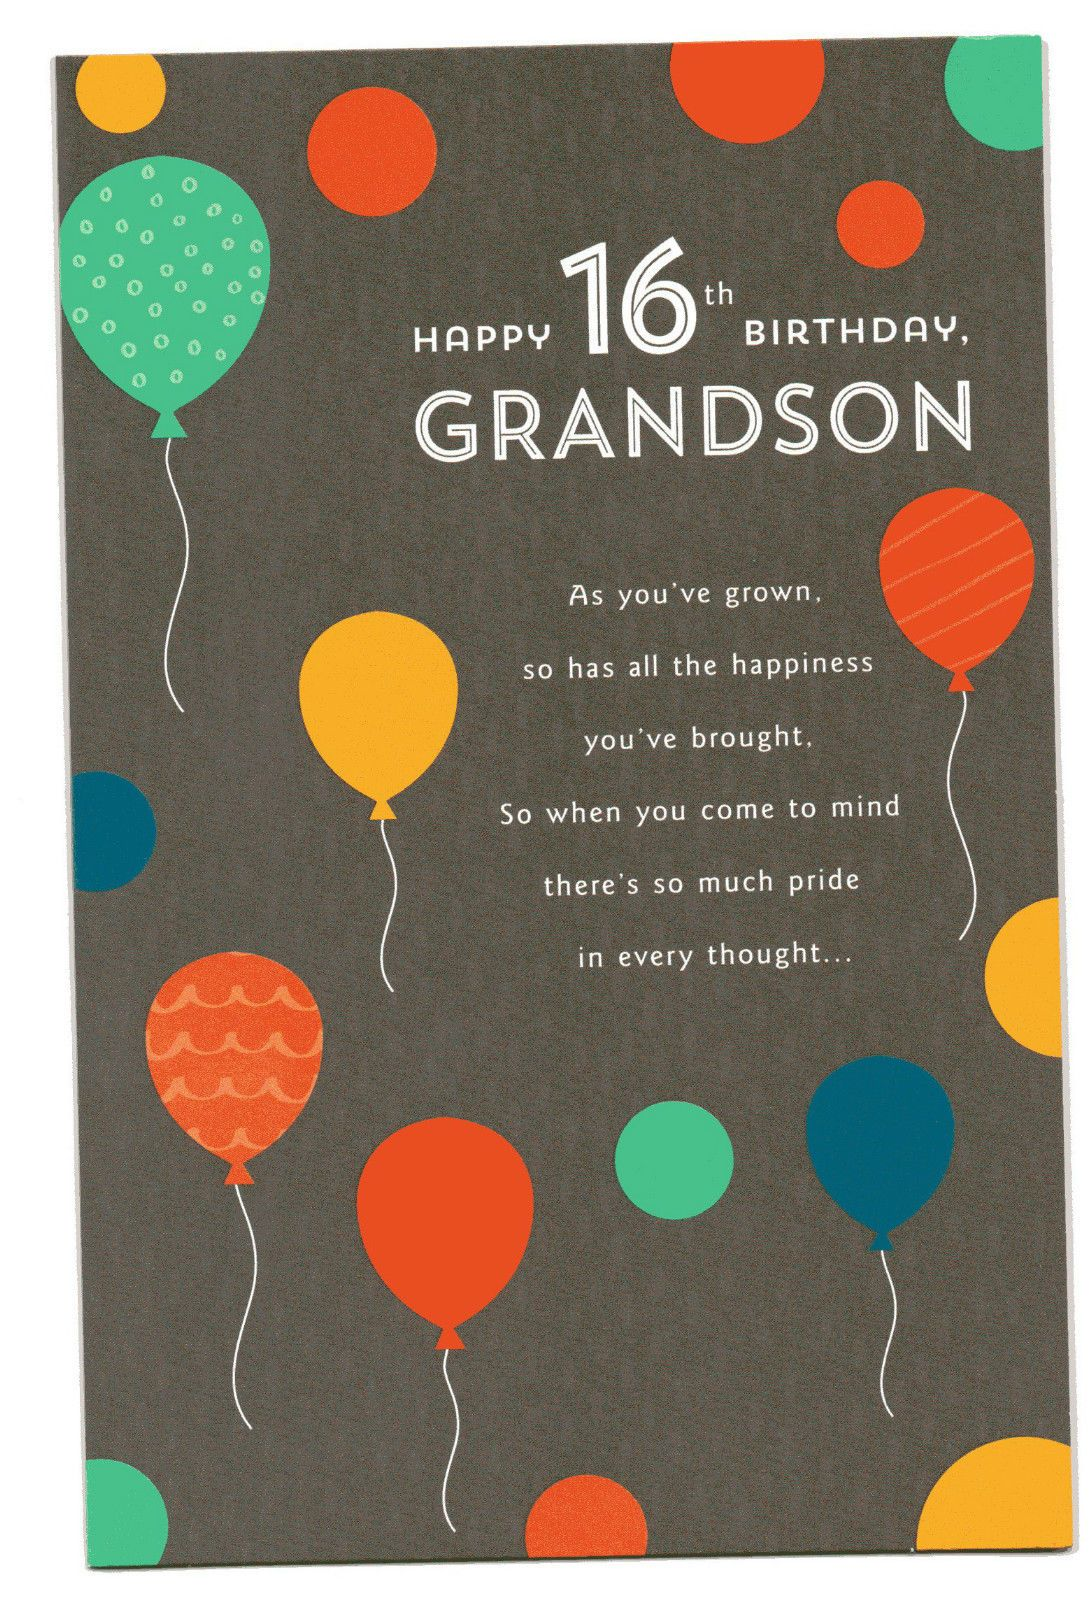 4 35 Gbp Happy 16th Birthday Grandson Three Fold 16 Greeting Card With Lovely Words Ebay Ho Happy 16th Birthday 16th Birthday Wishes 16th Birthday Card